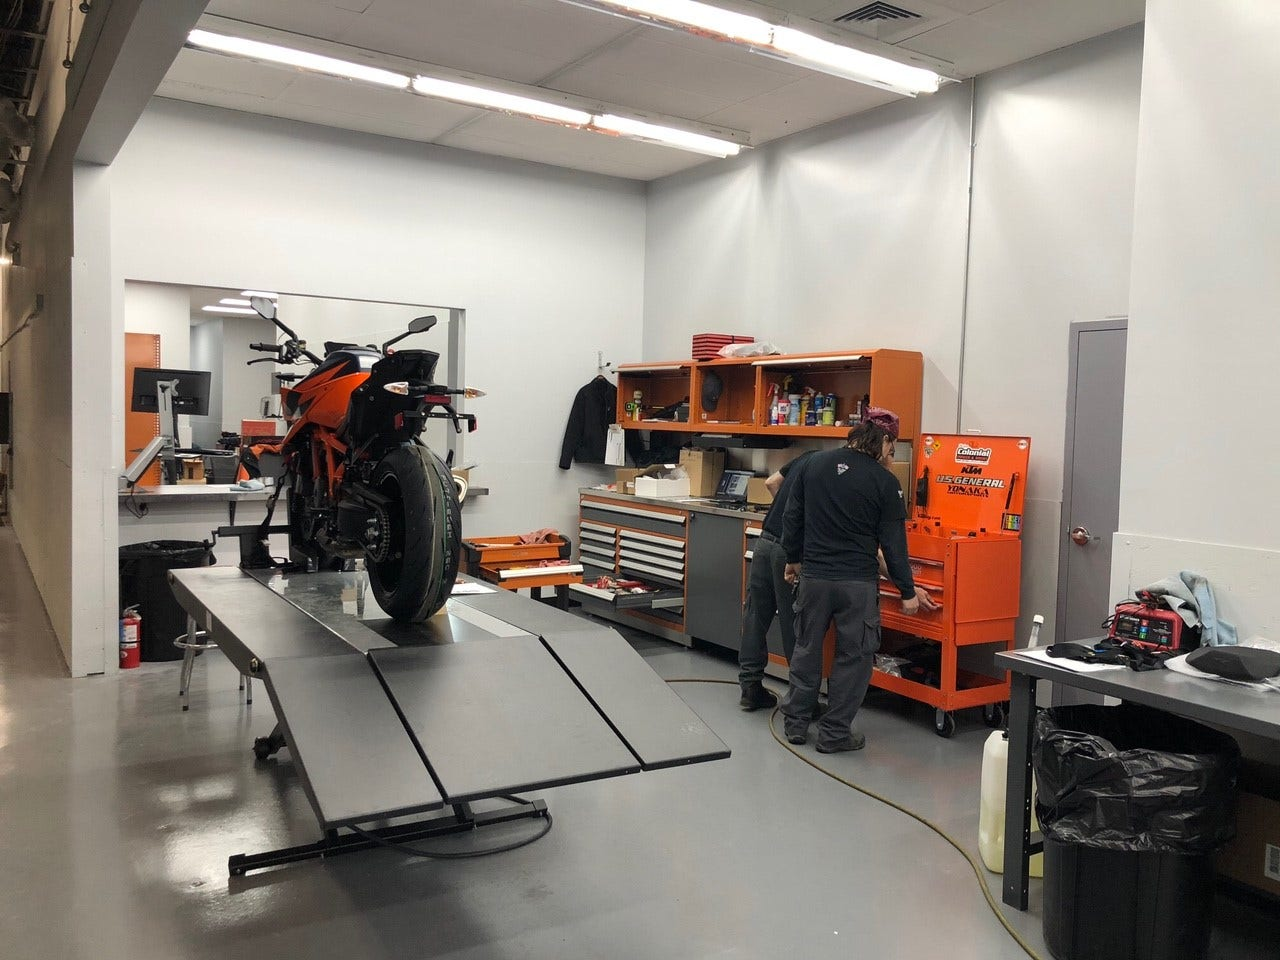 KTM PowerParts and Maintenance